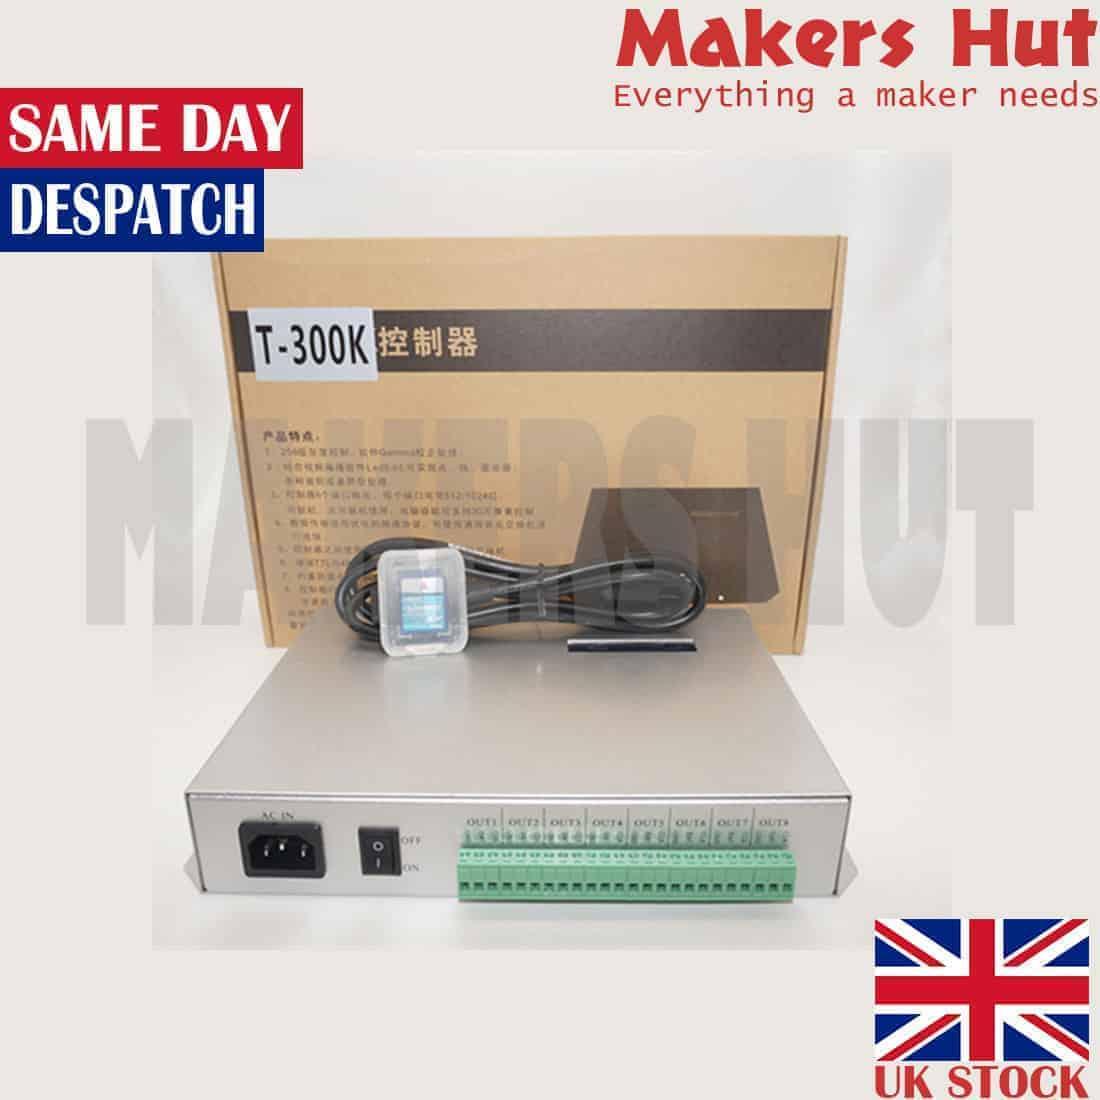 457c0fc8040 T-300K Controller SD Card Online VIA PC RGB Full Color LED 8 Ports 8192  Pixels